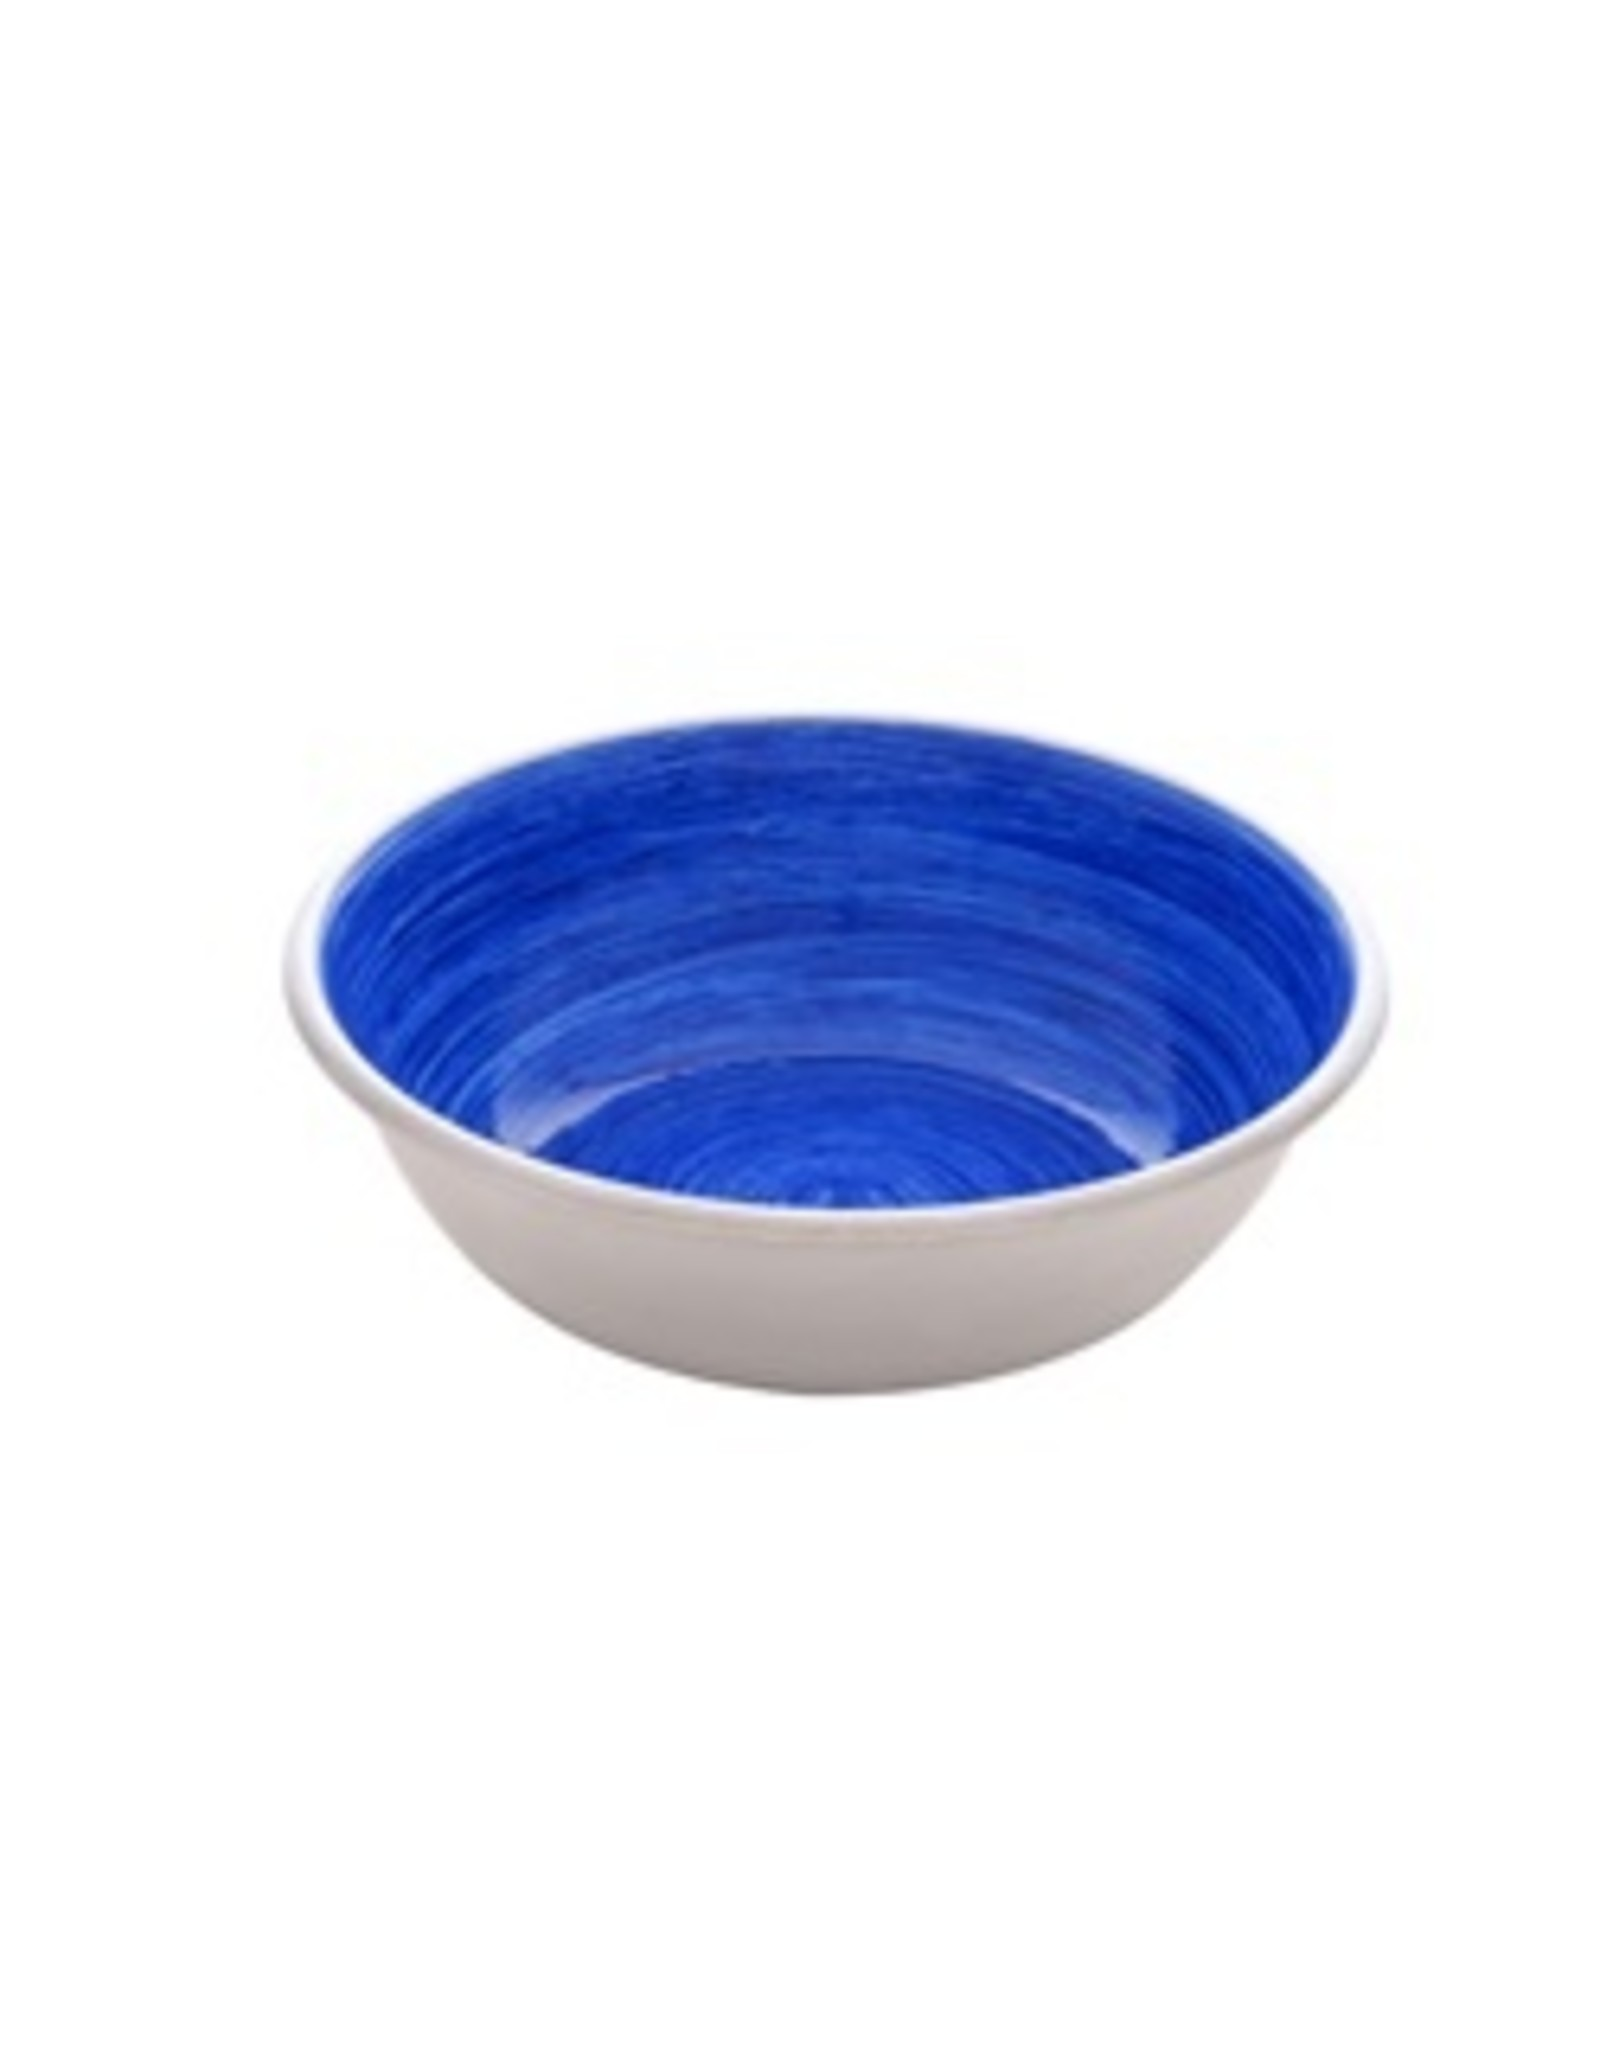 DogIt Stainless Steel Non-Skid Bowl Blue 350ml